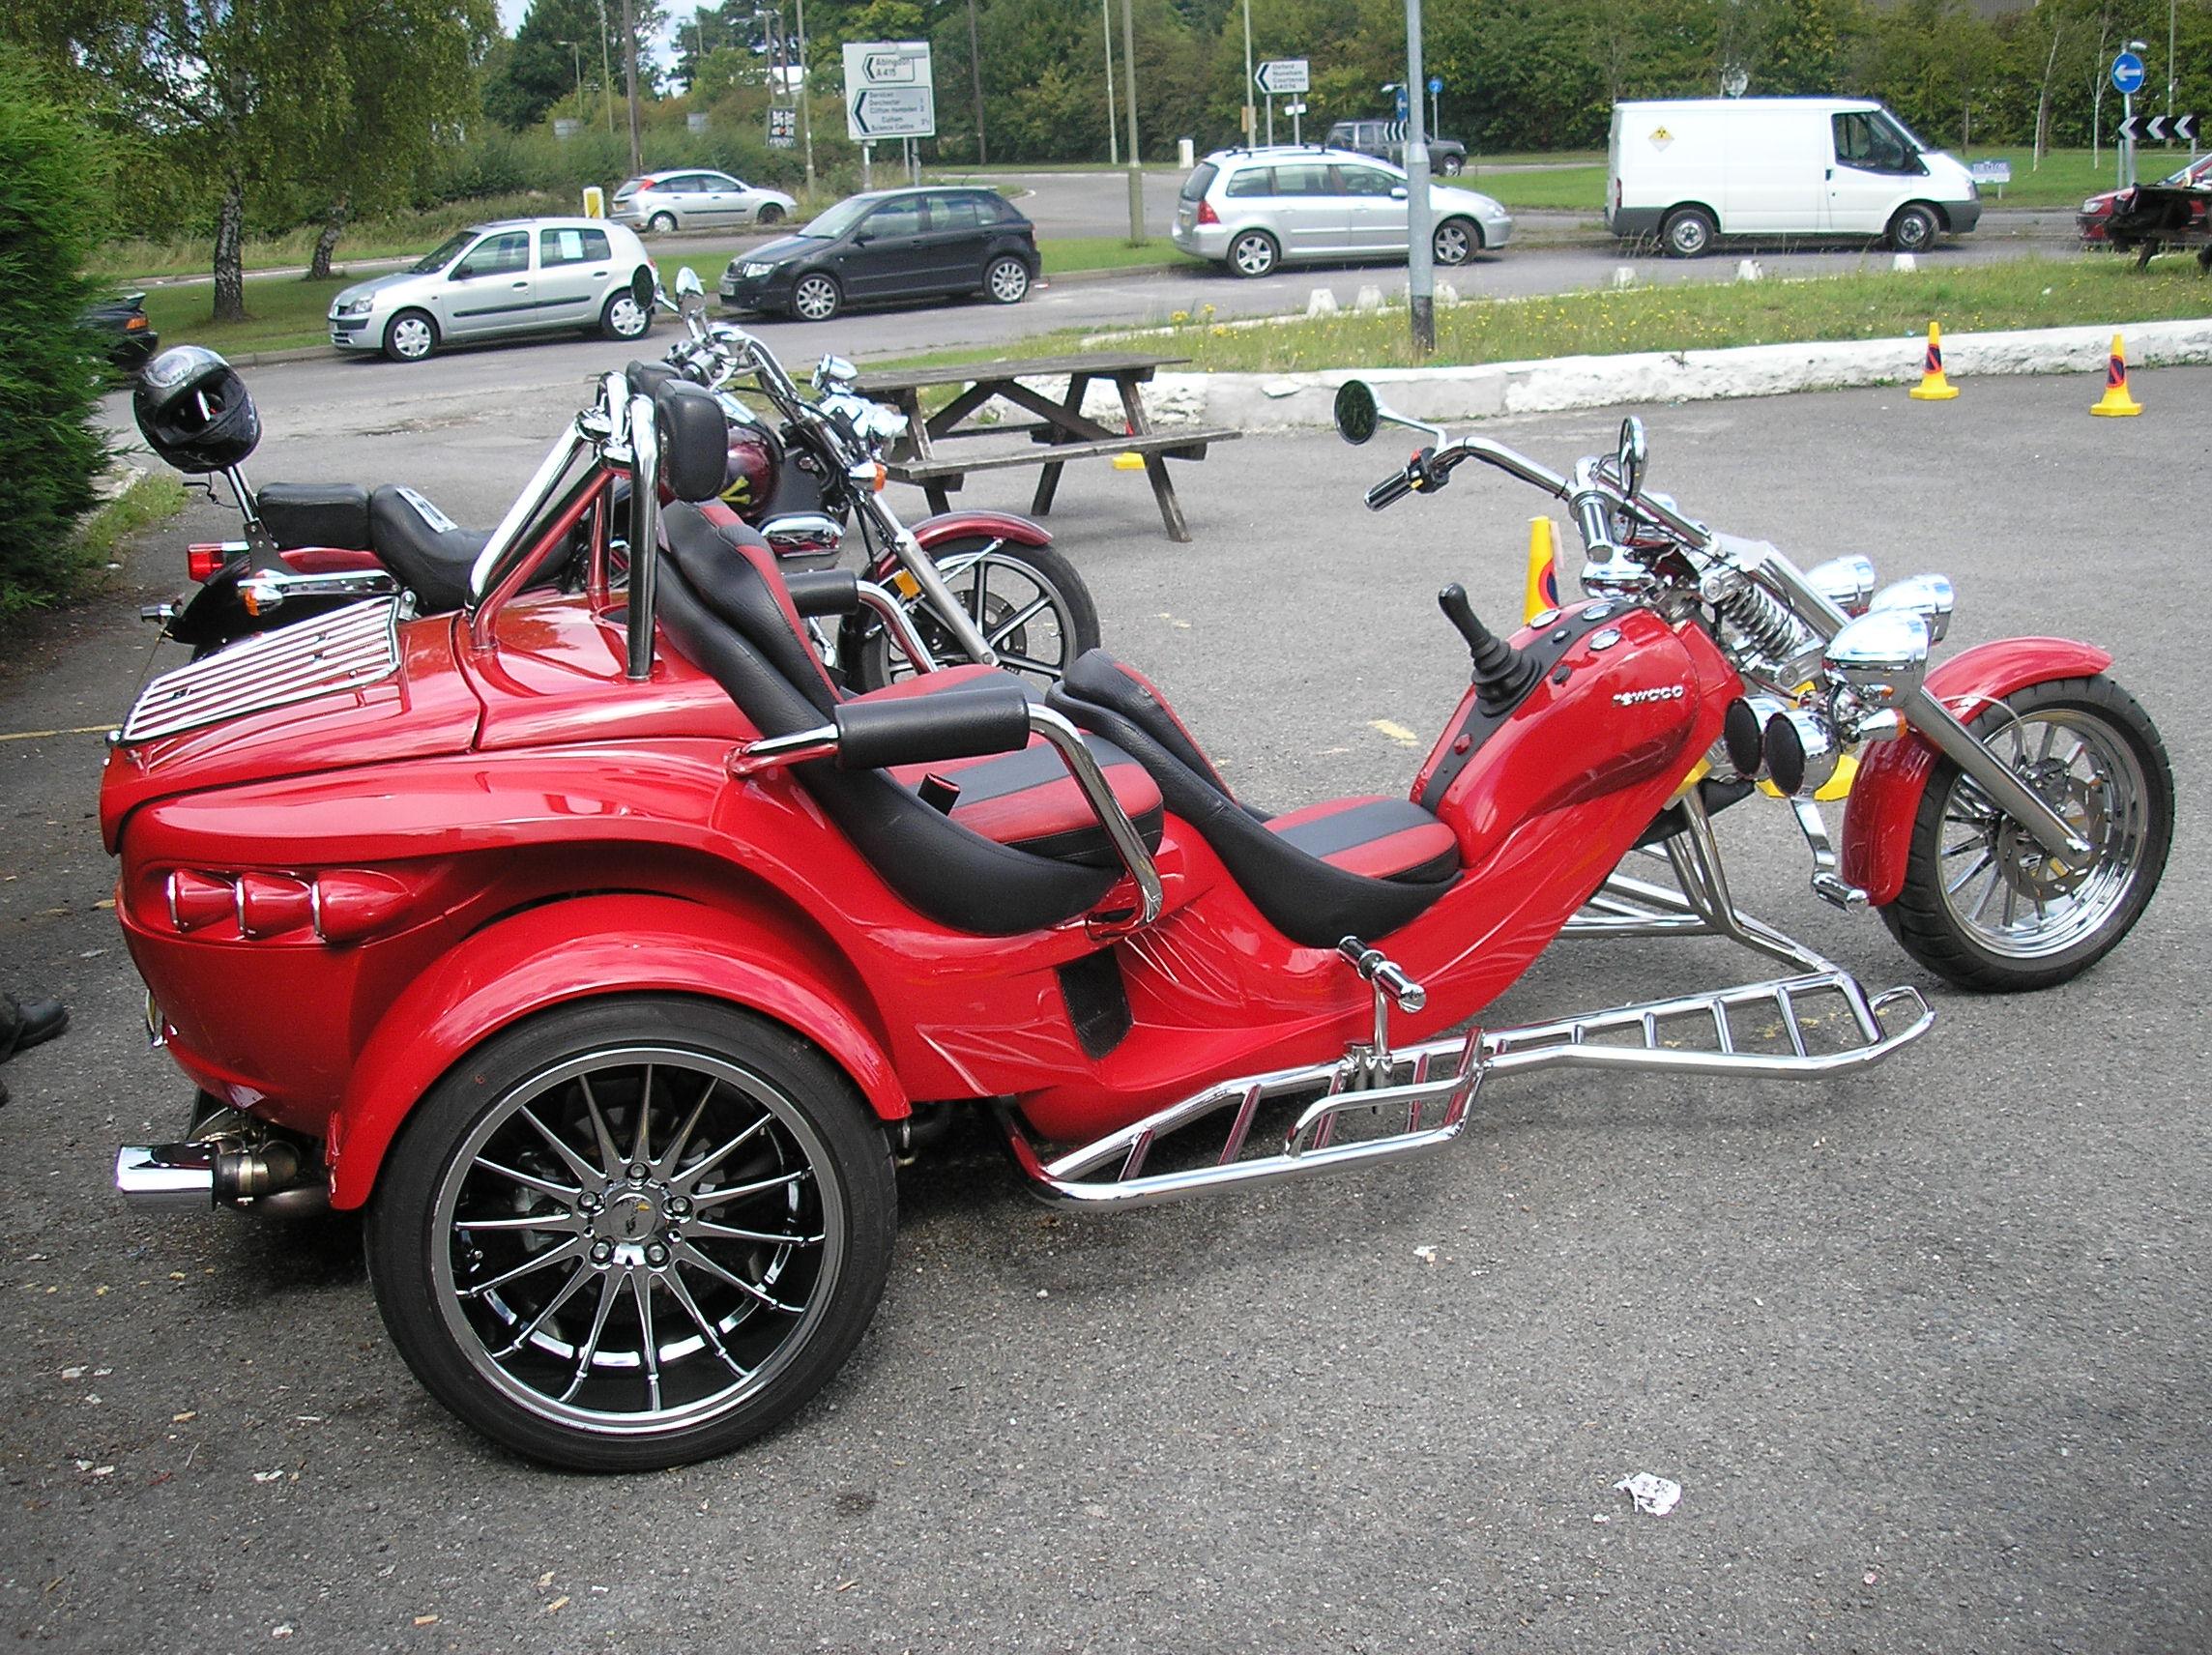 Vw Trike also Pool 814227 n23 kenjonbro further Beaulieu Hosts Vw Santa Run as well 454441418627030325 likewise Custom Vw Trikes For Sale. on custom car engined trikes